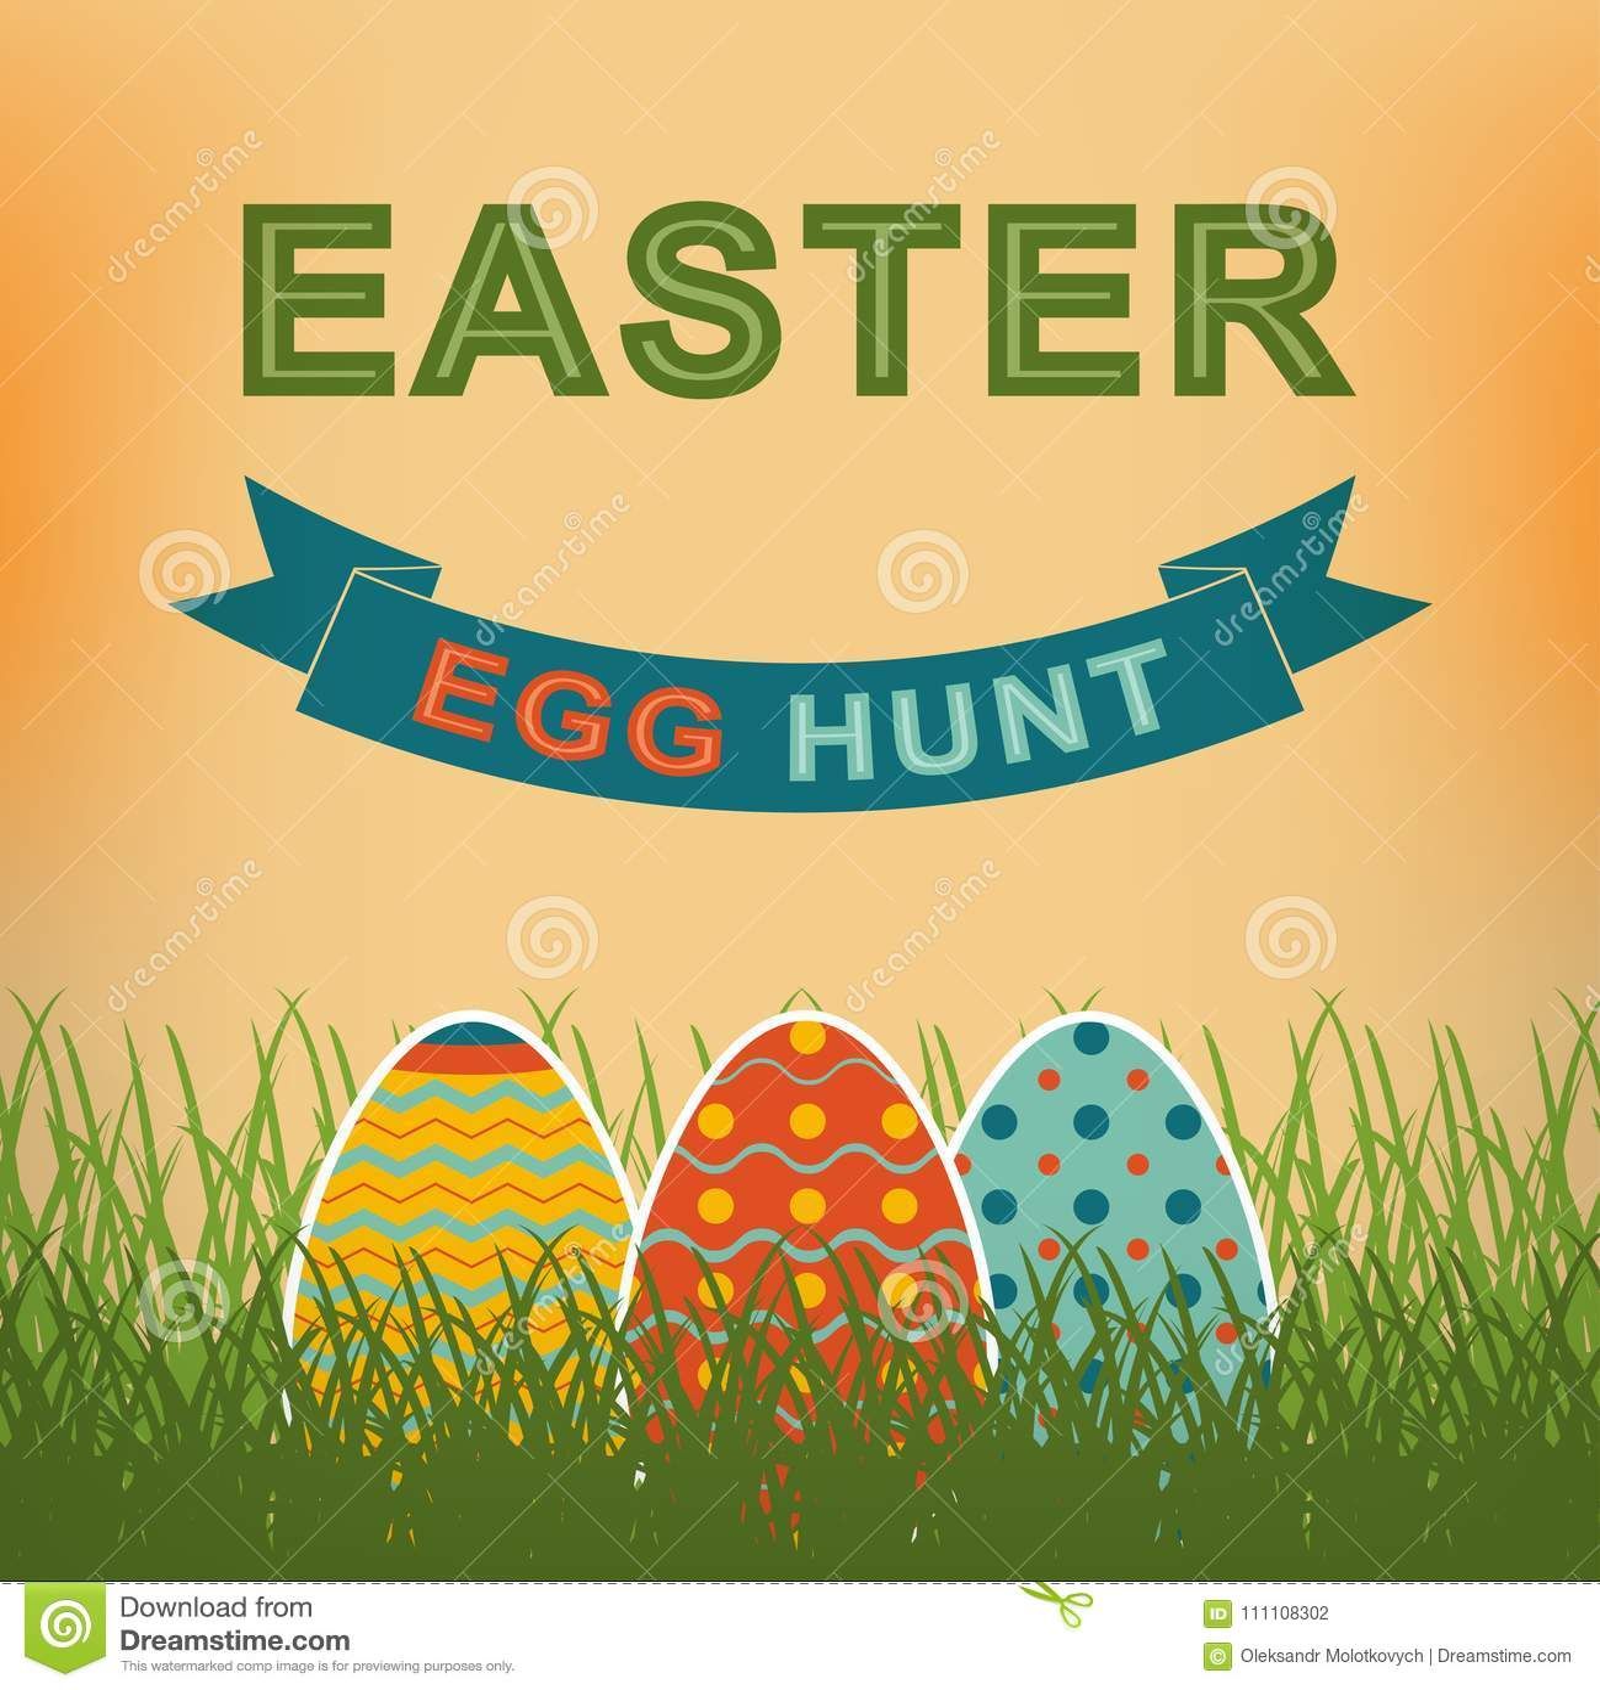 download easter egg hunt vector retro background template for your easter design stock vector